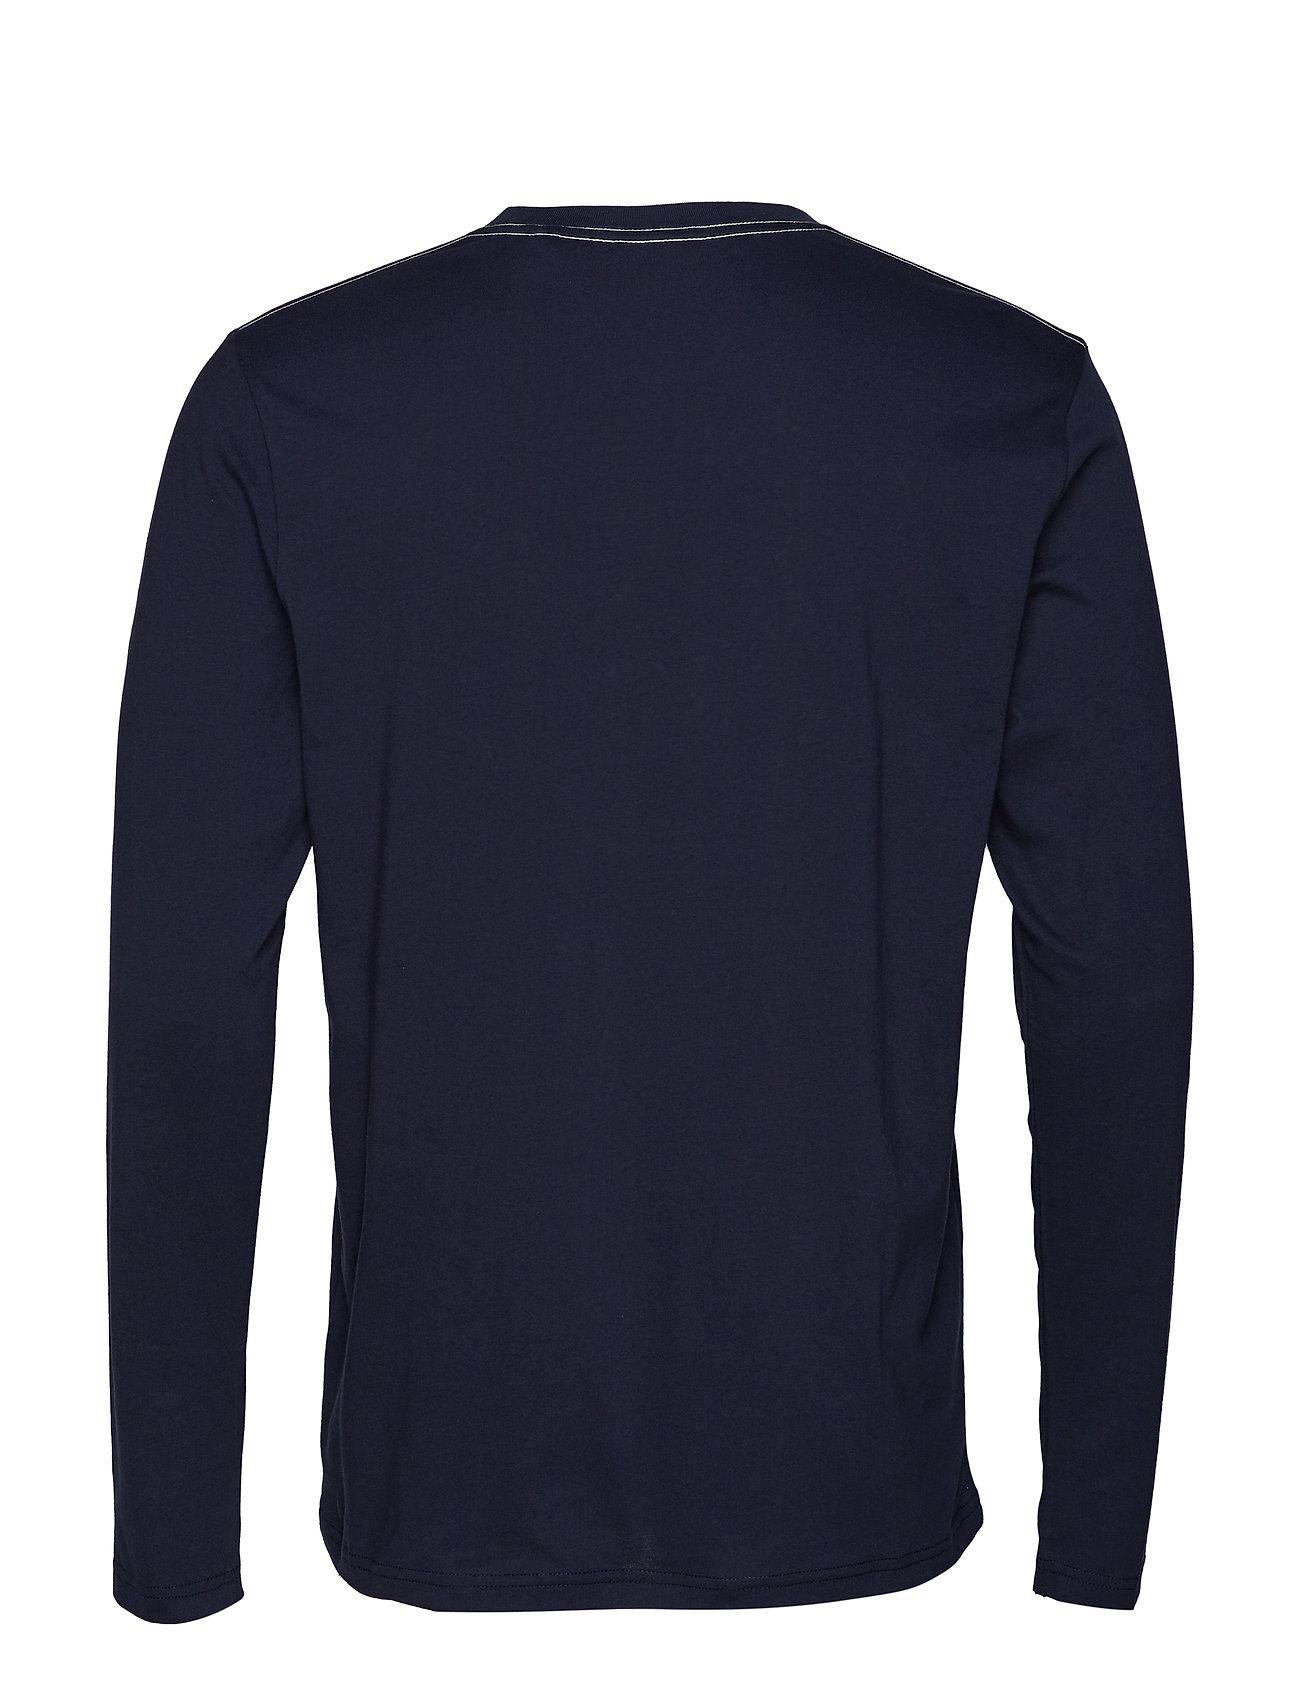 T O1New BlueGant Ls Haven shirtevening uOPkZiTX